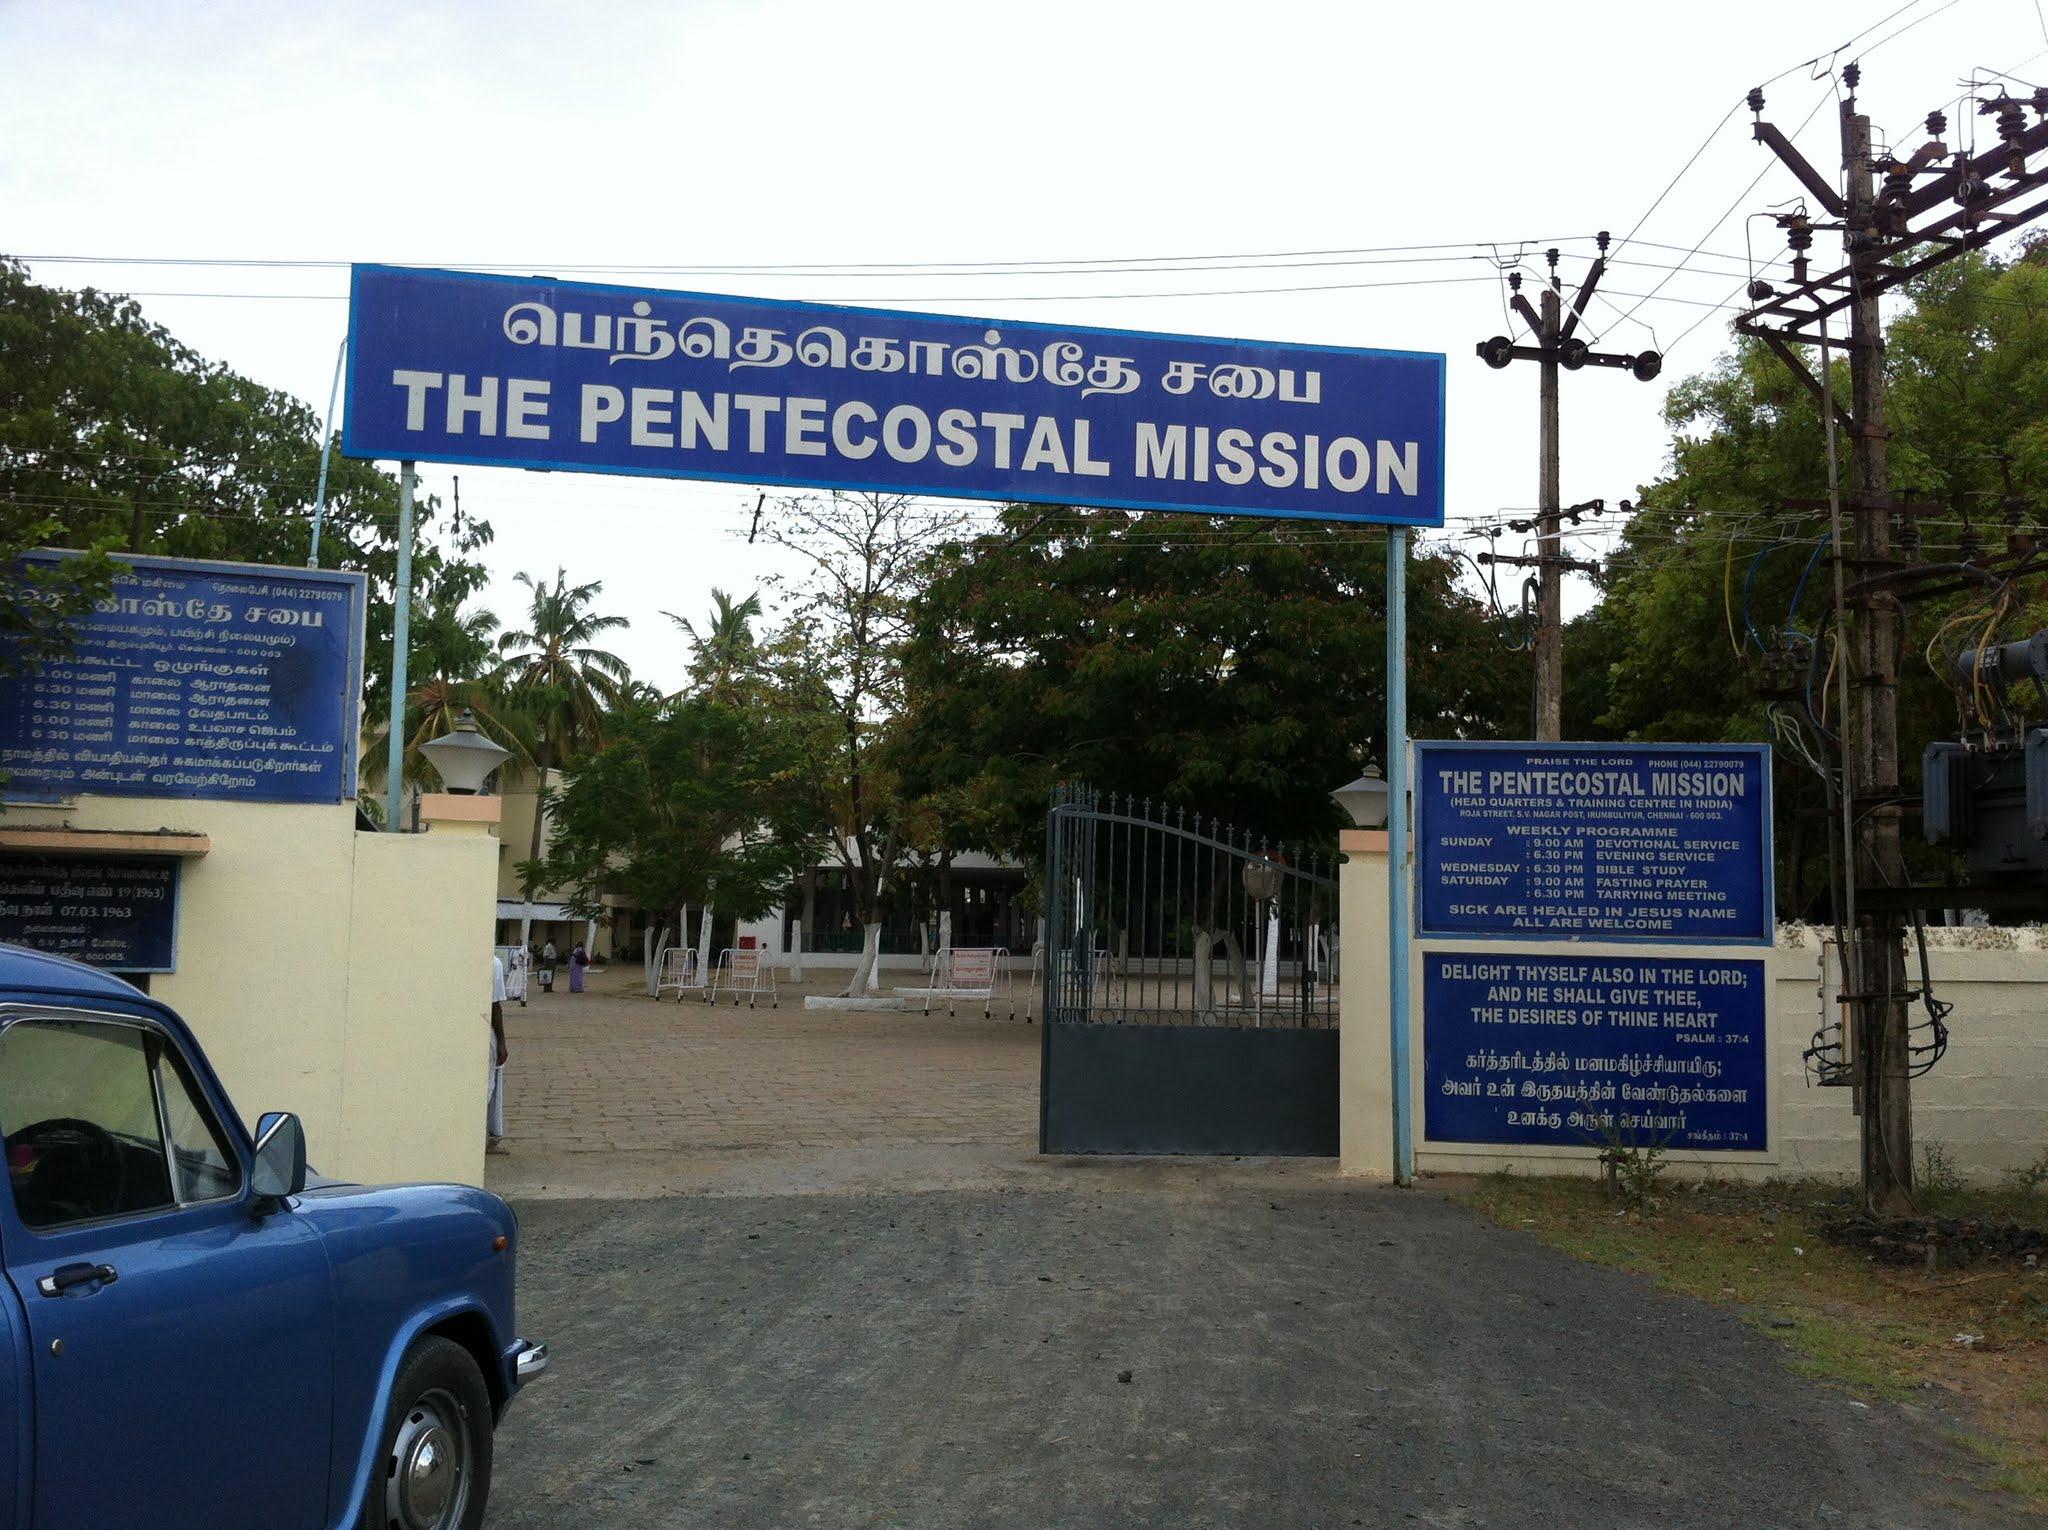 Pentacostal mission, Irumpuliyur, Tambaram